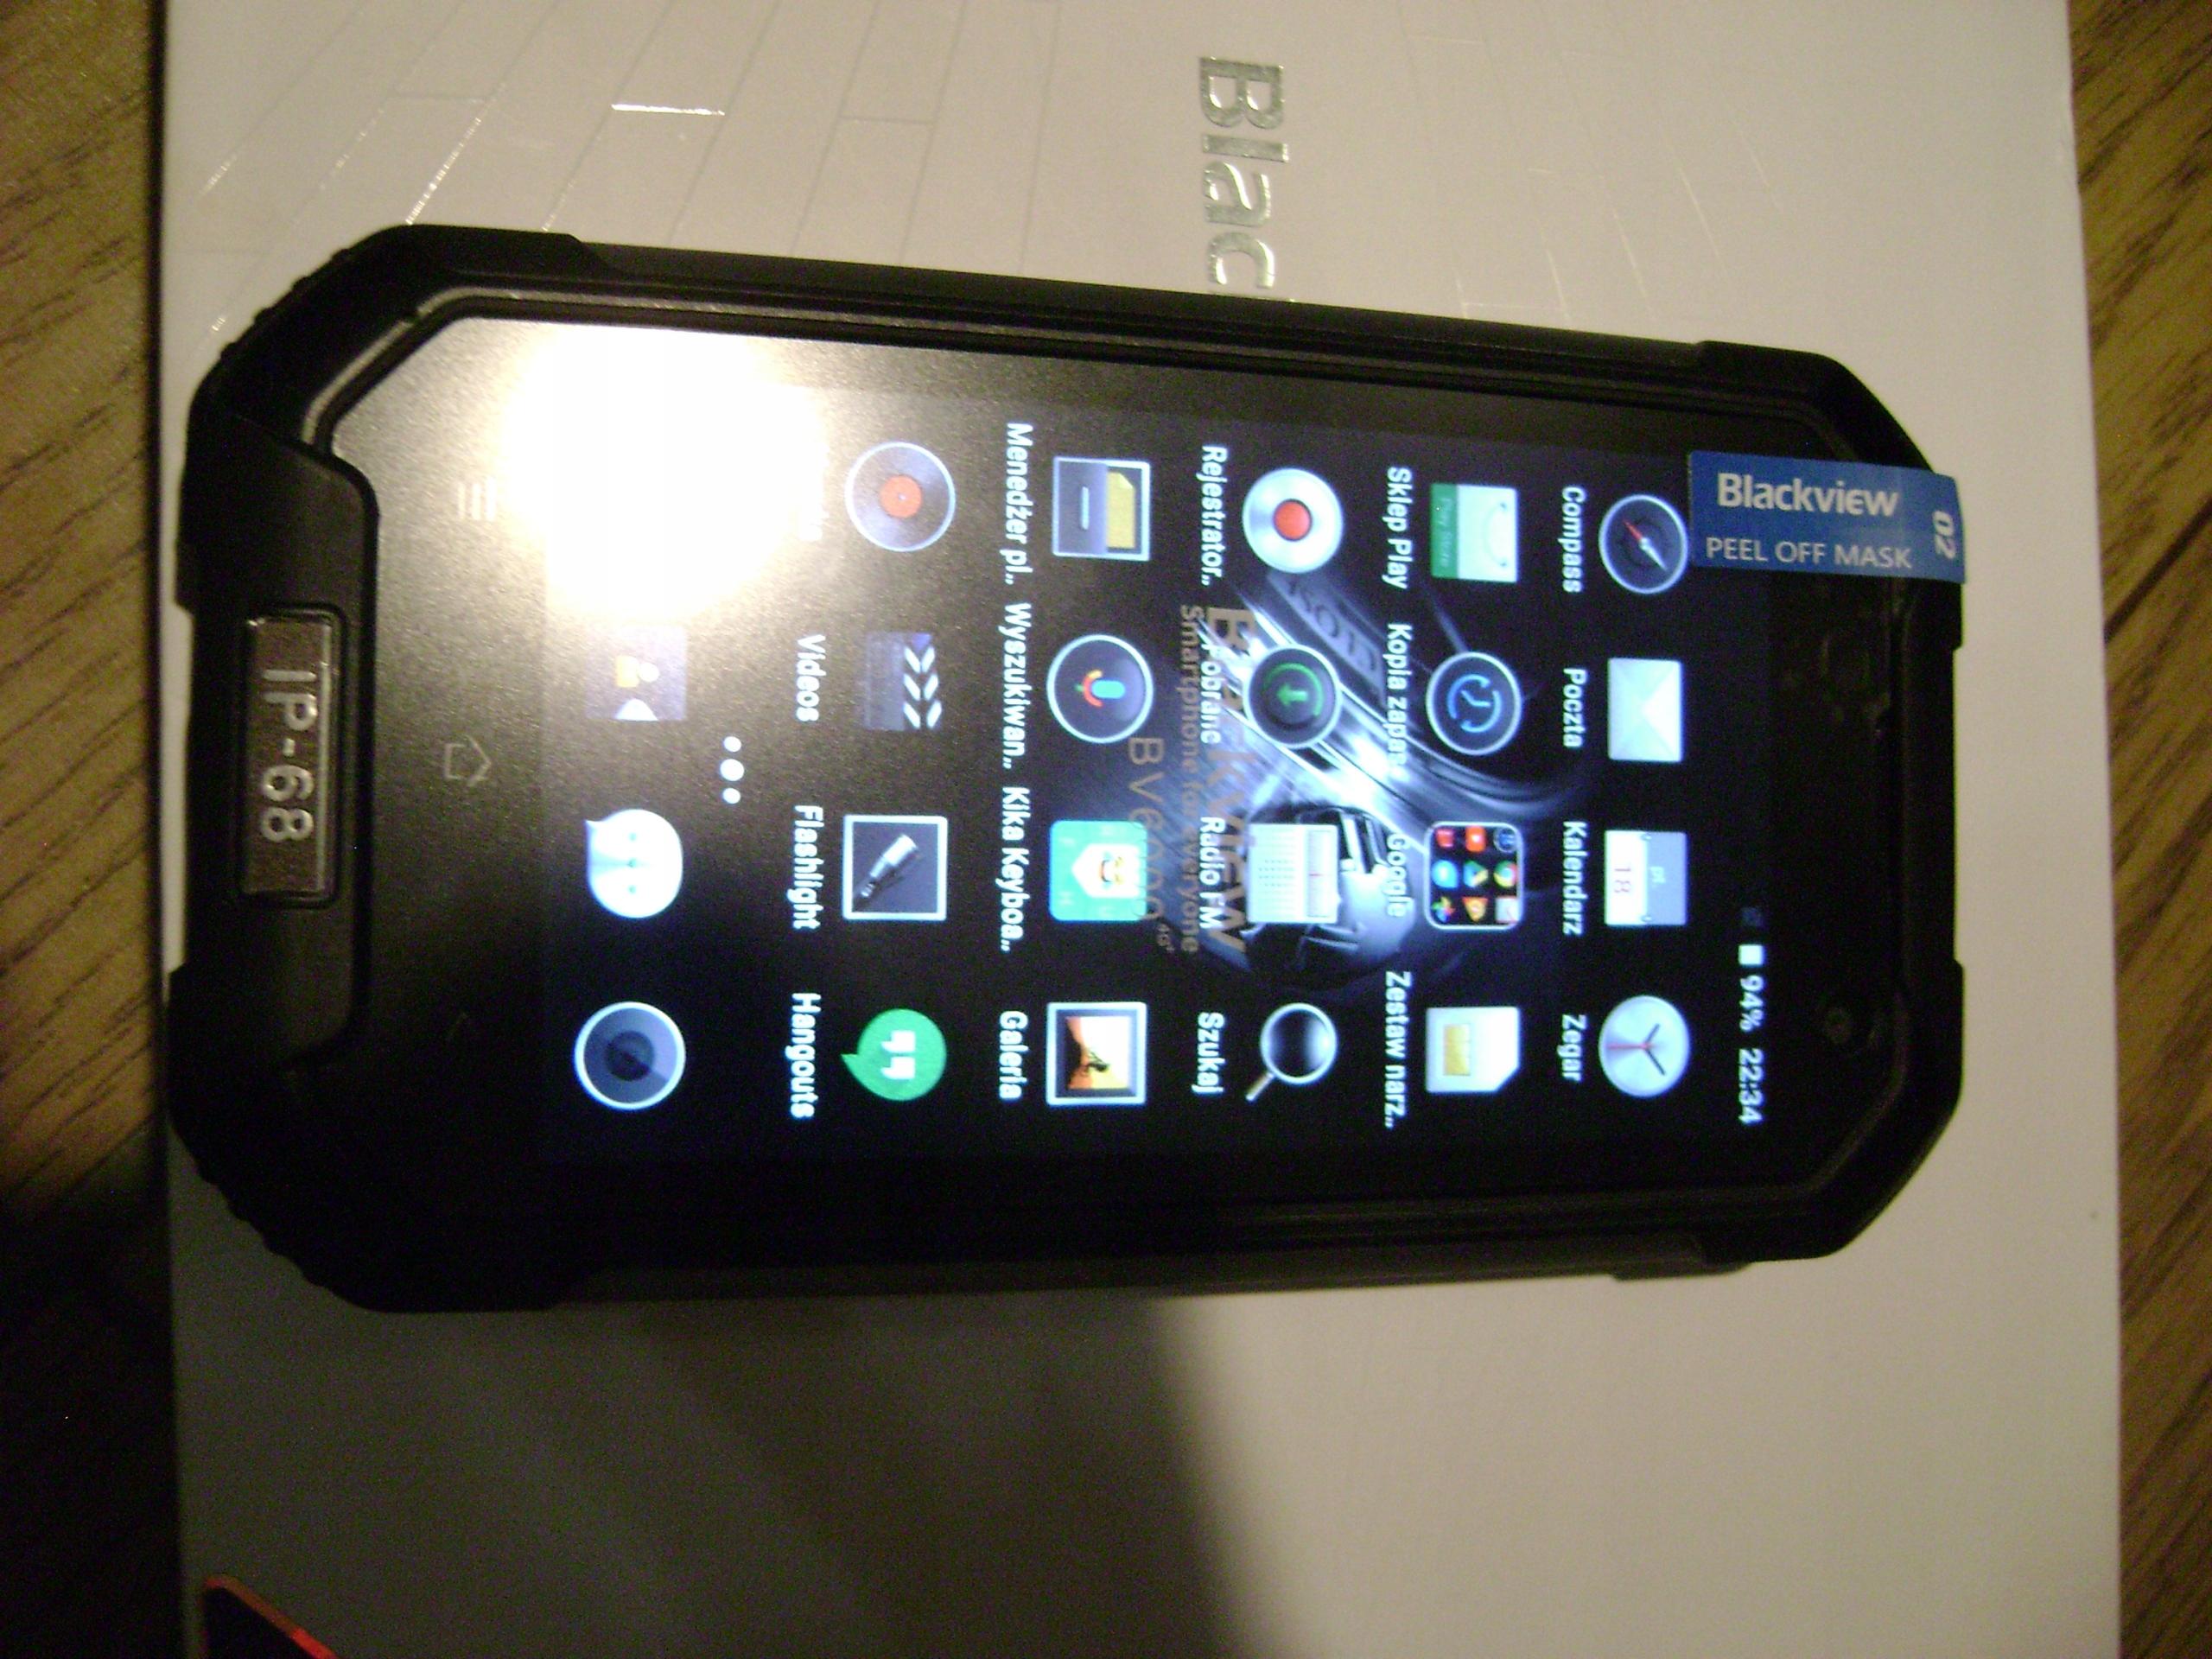 Blackview BV6000